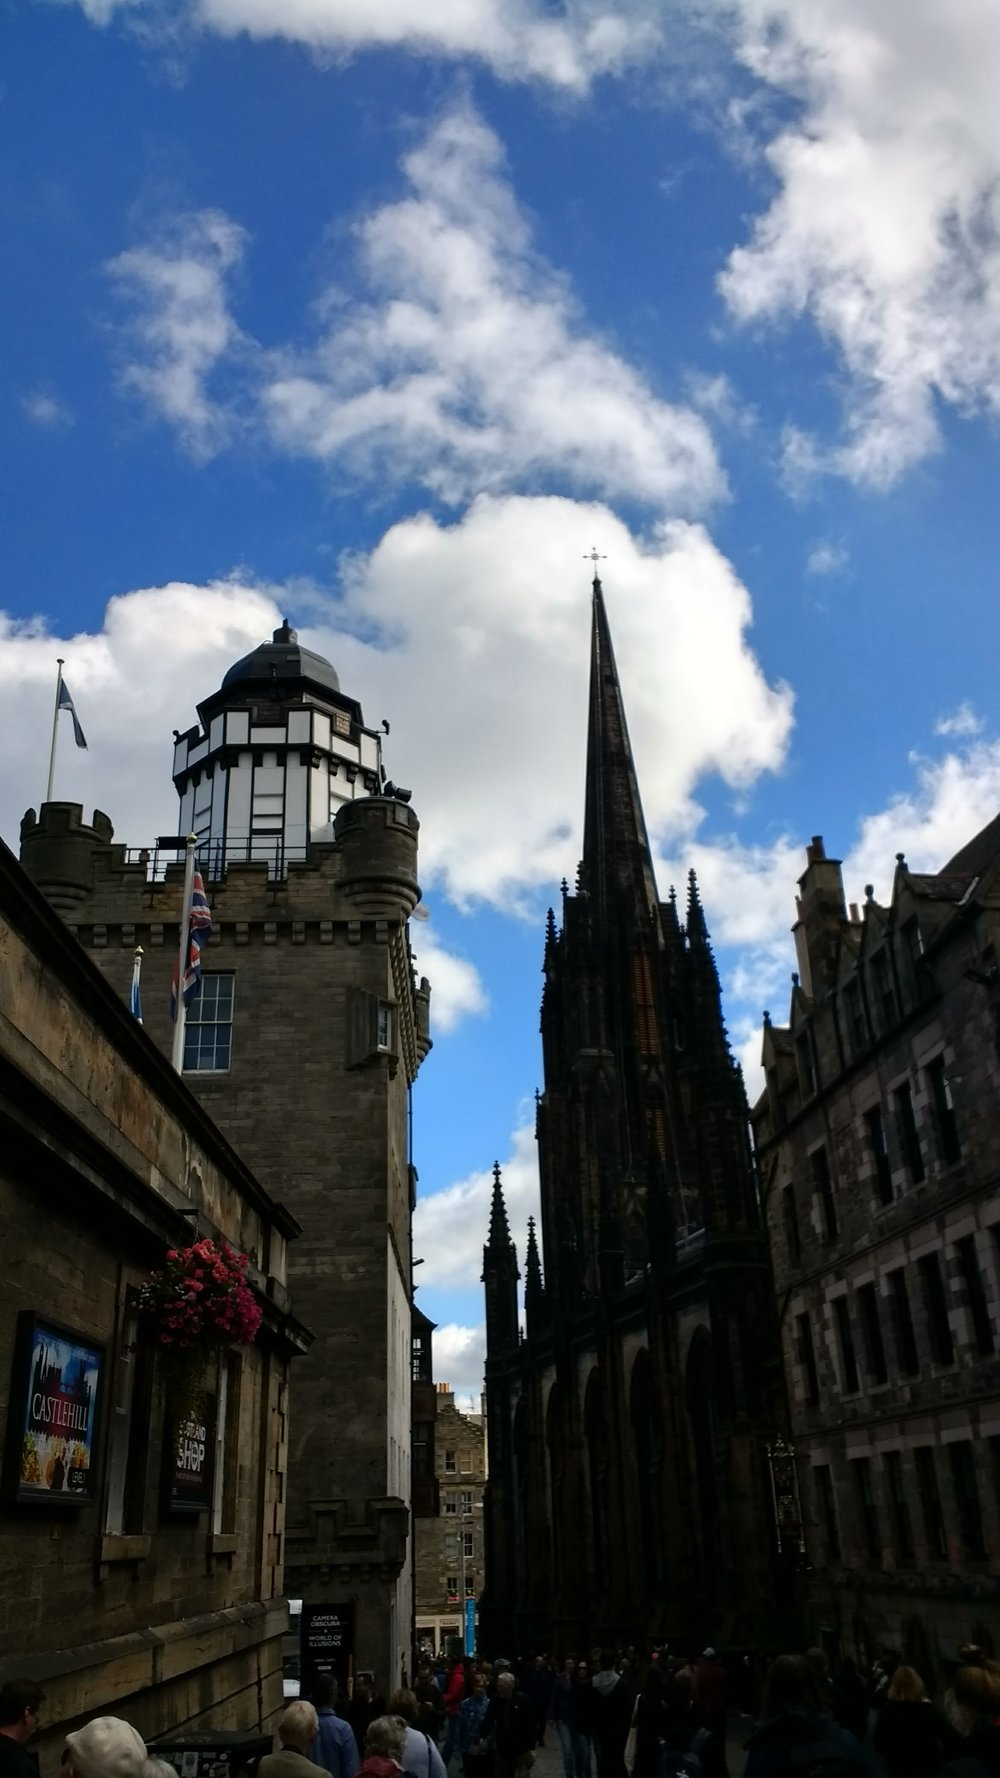 Edinburgh. It's just that beautiful.